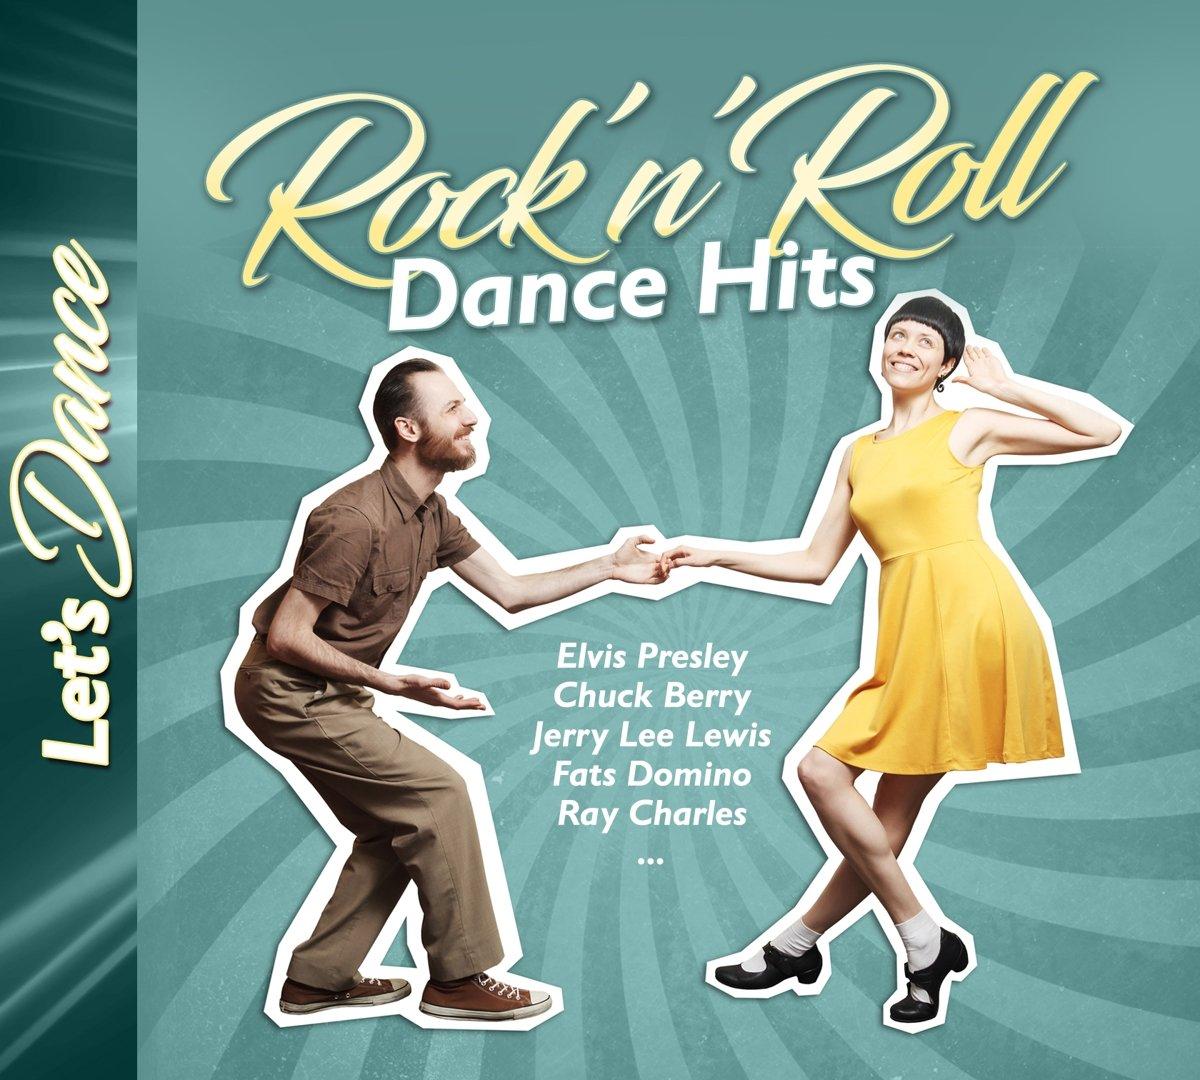 E. Presley, C. Berry, J. L. Lewis. Rock'N'Roll Dance Hits (2 CD) dance top hits 6 4 cd